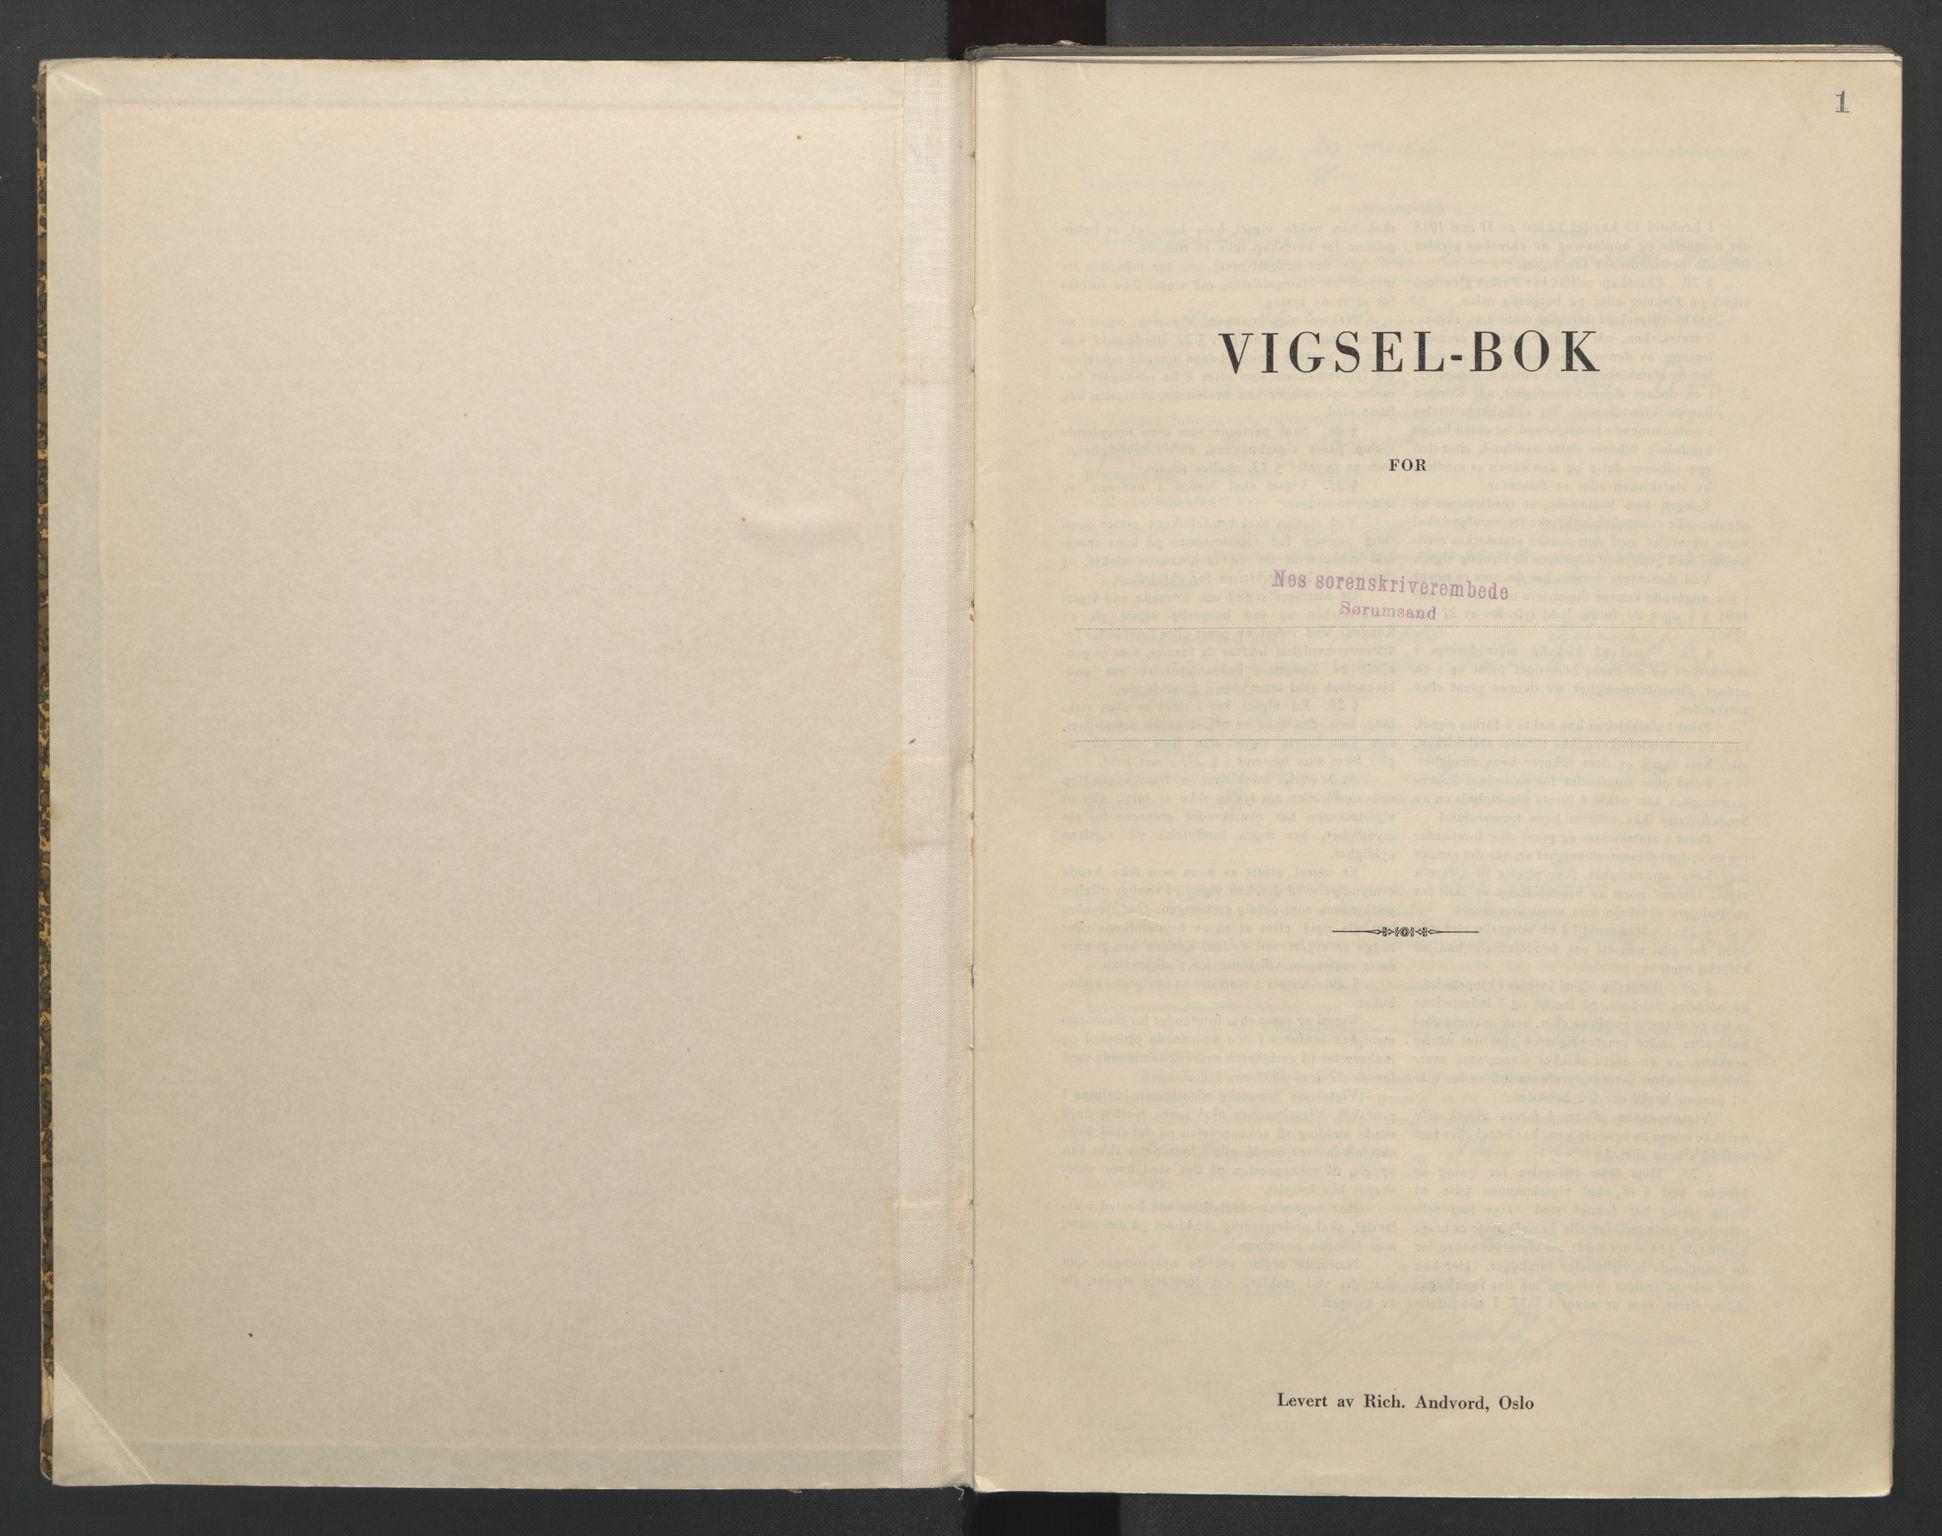 SAO, Nes tingrett, L/Lc/Lca/L0002: Vigselbok, 1943-1944, s. 1